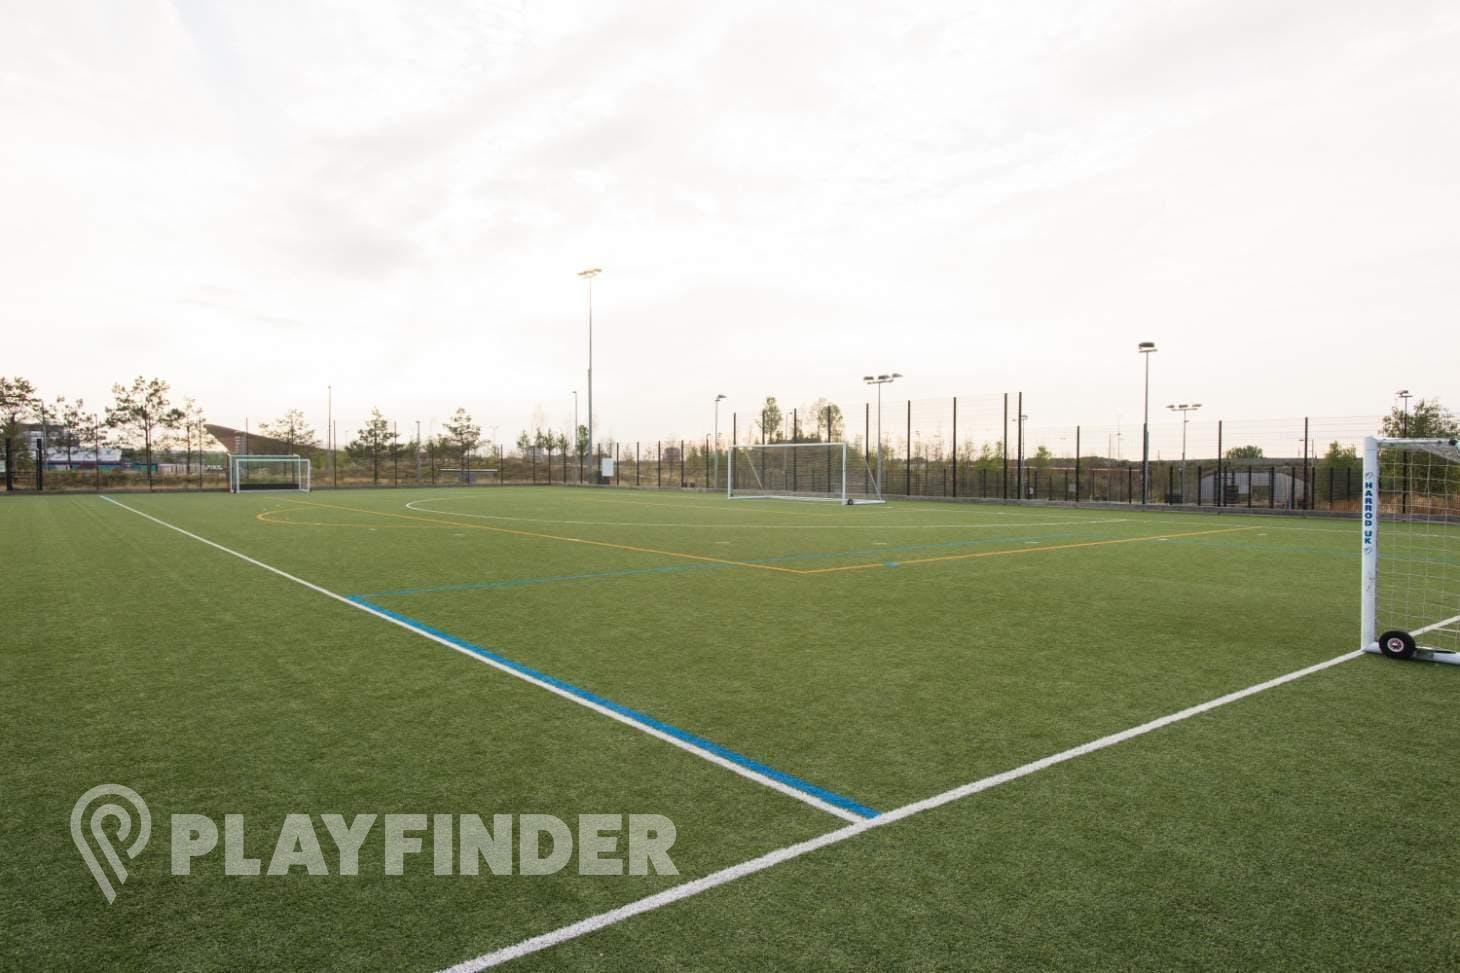 Chobham Academy Training pitch   3G Astroturf rugby pitch